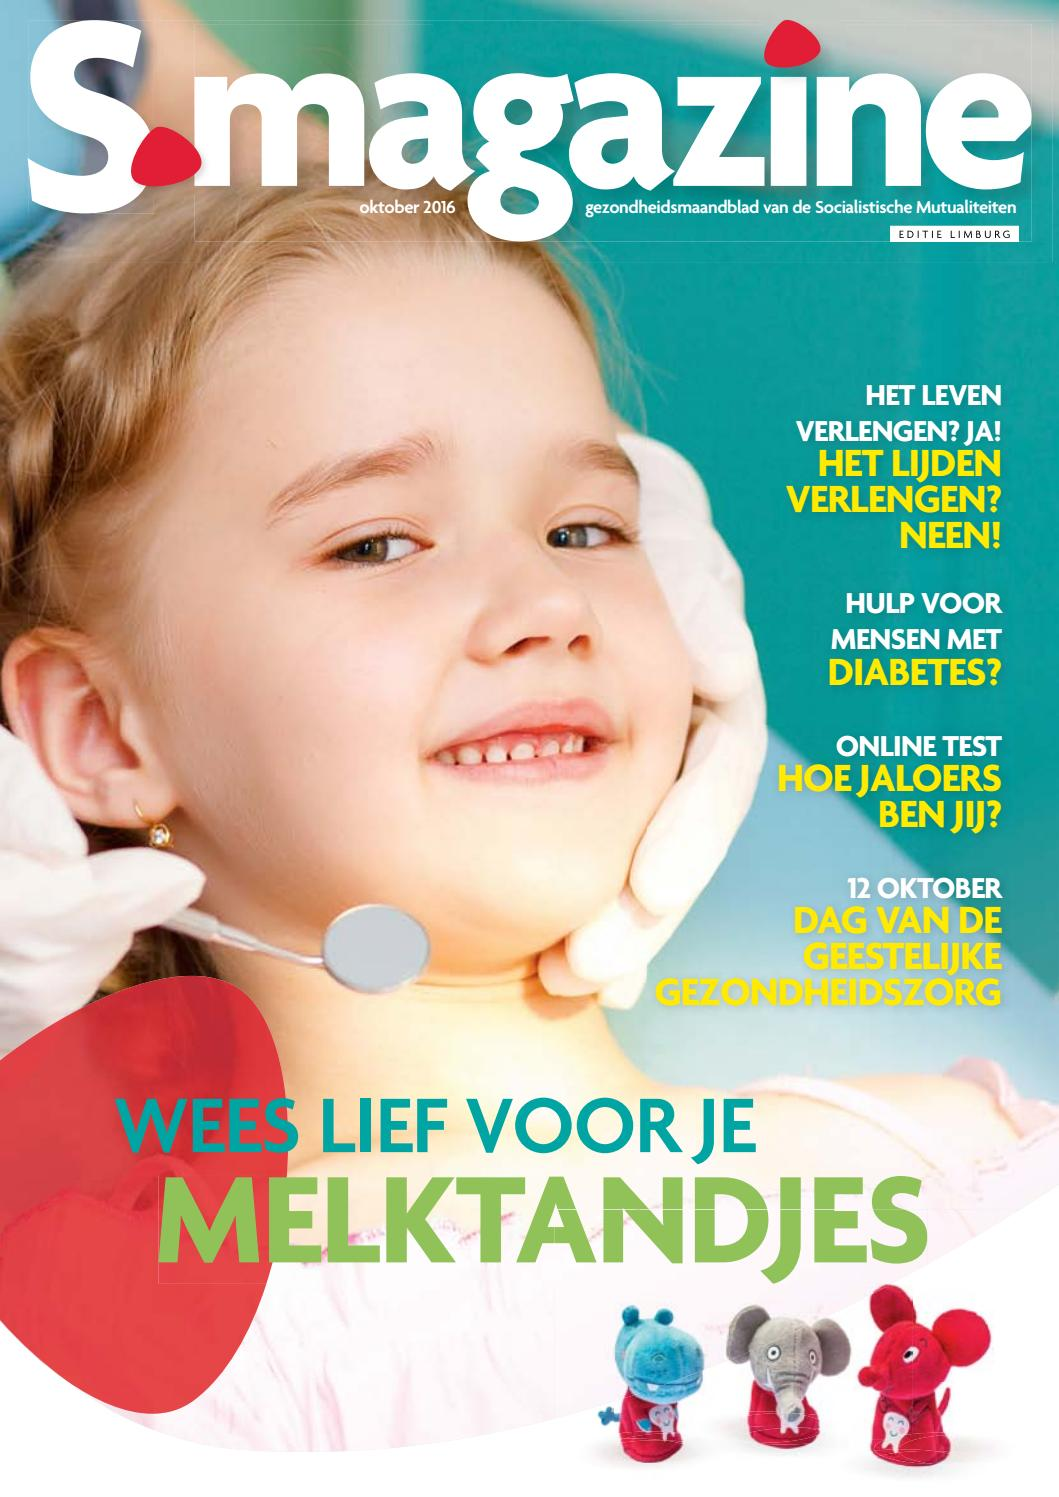 1c5111f860ddb9 Oktober 2016 S-magazine by NVSM - issuu